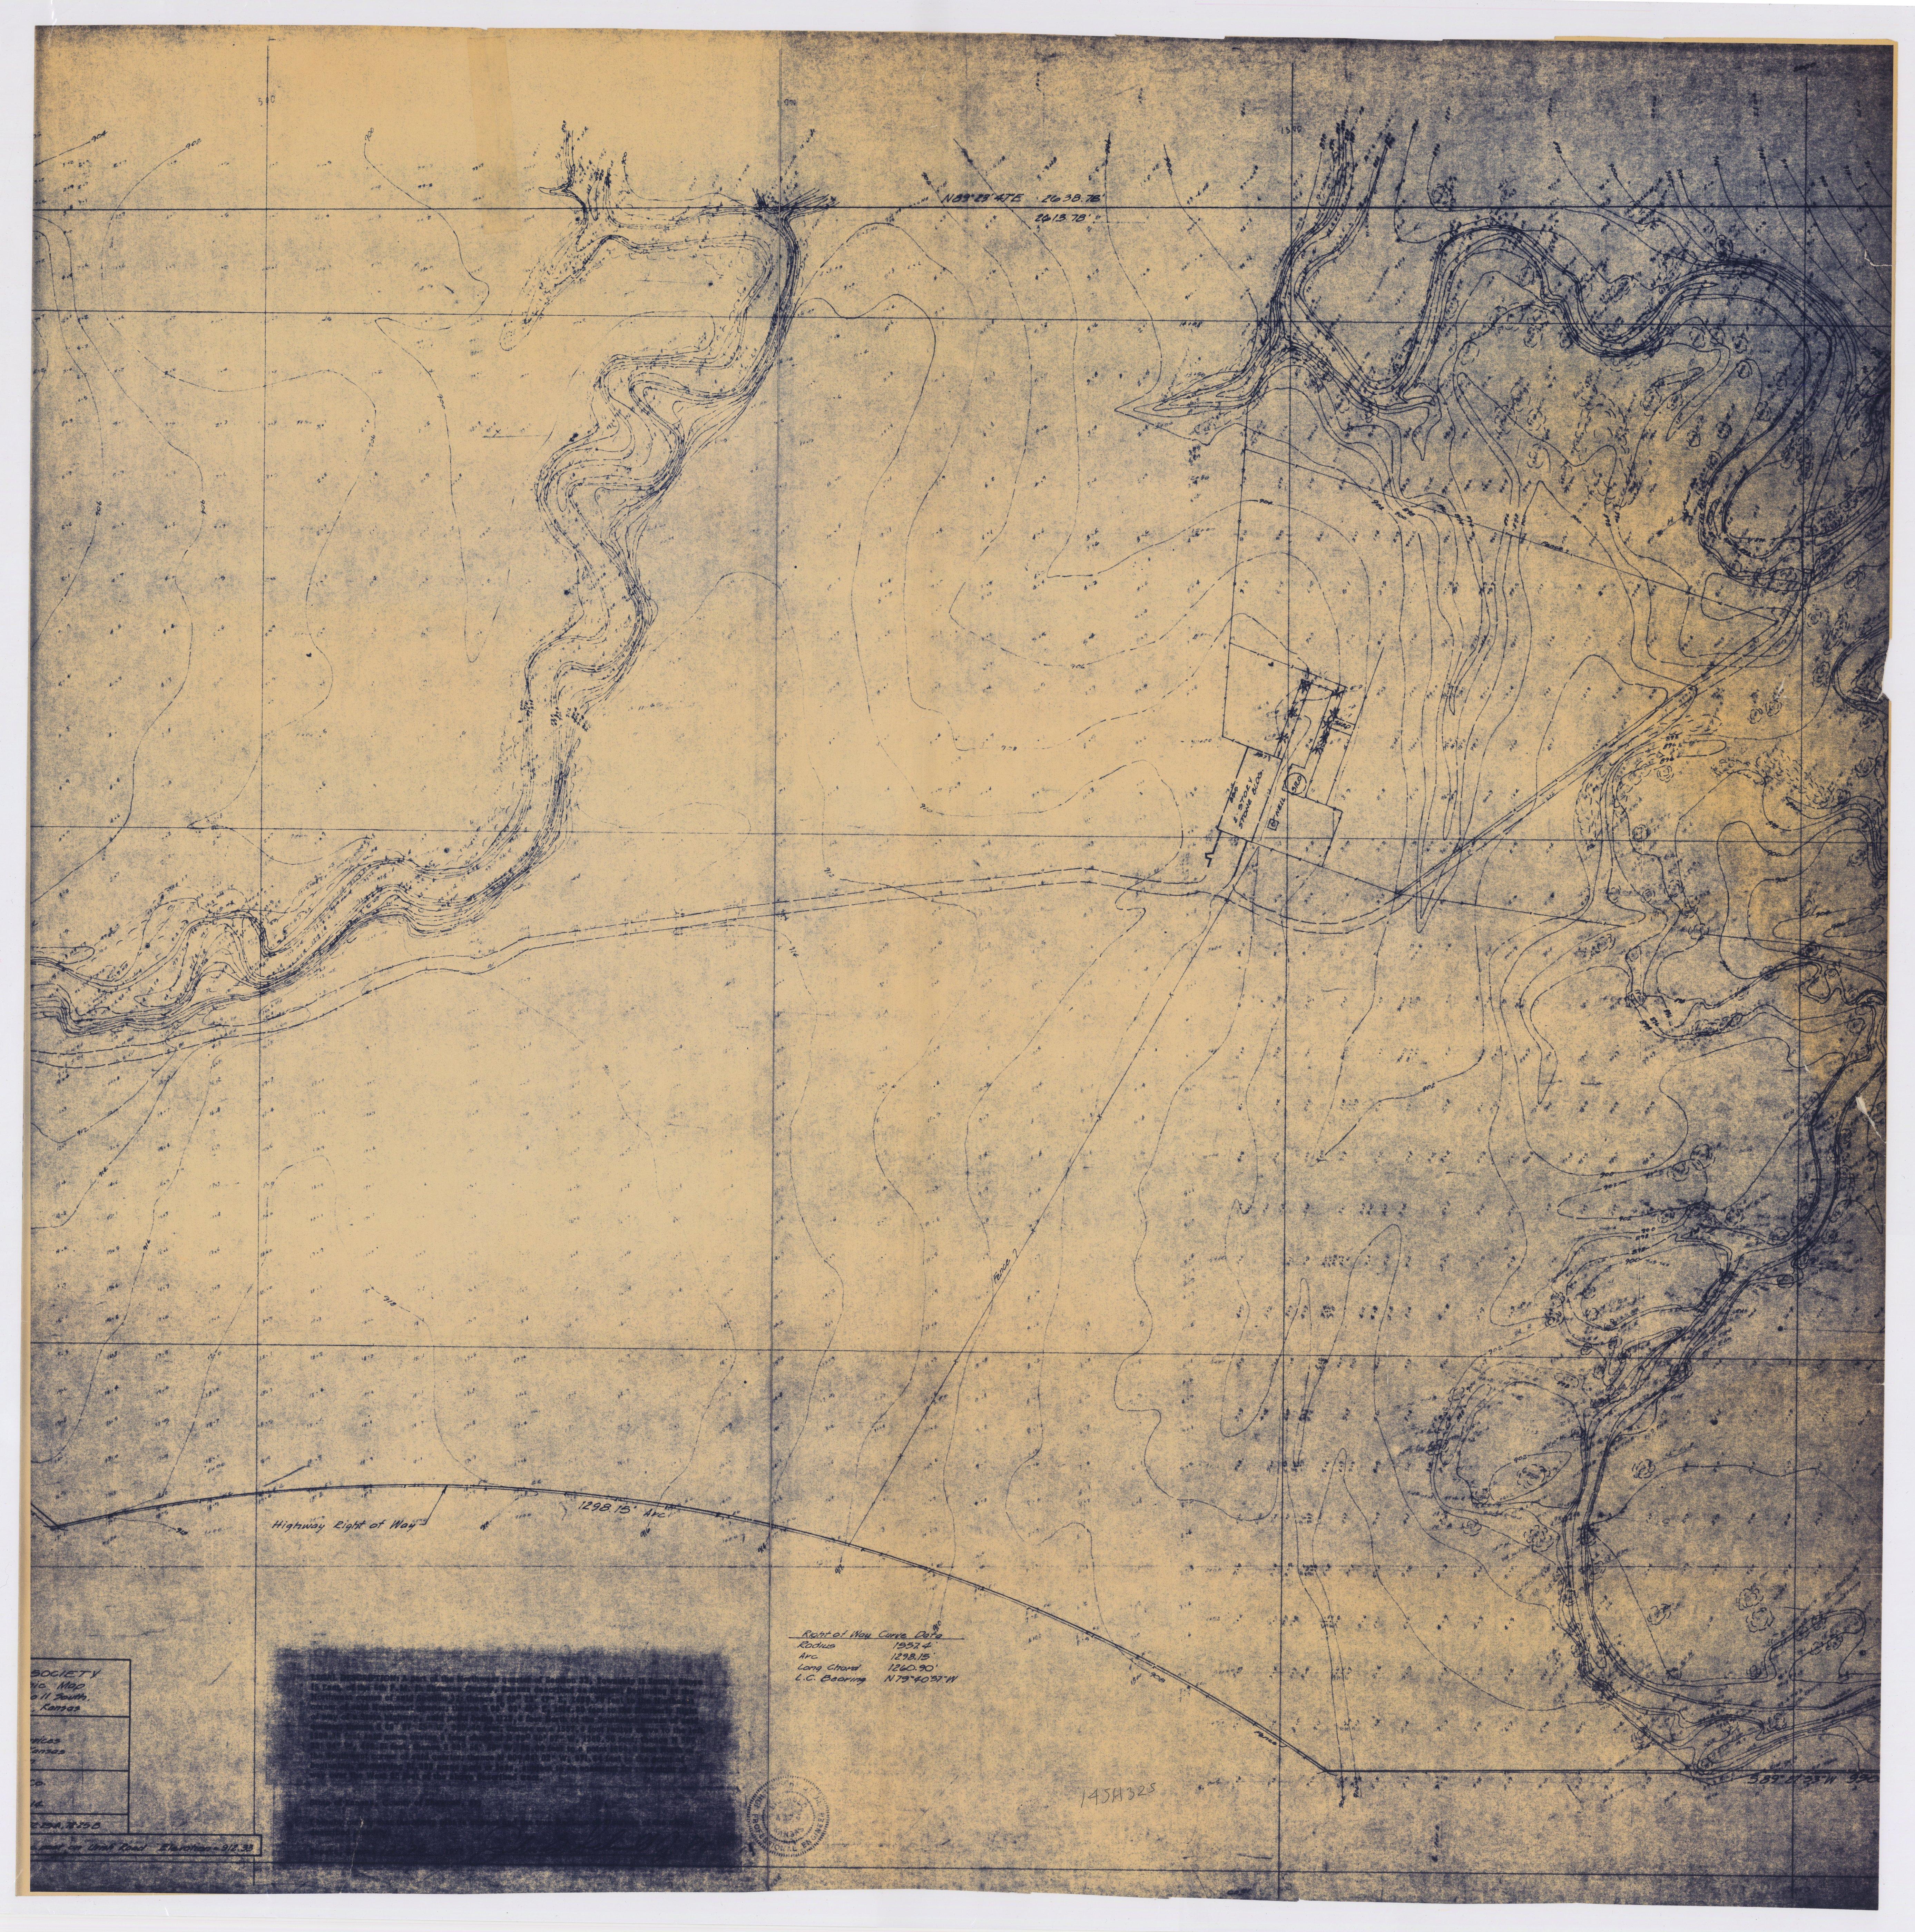 Oversized Maps of the Pottawatomi Mission, 14SH325 - 1